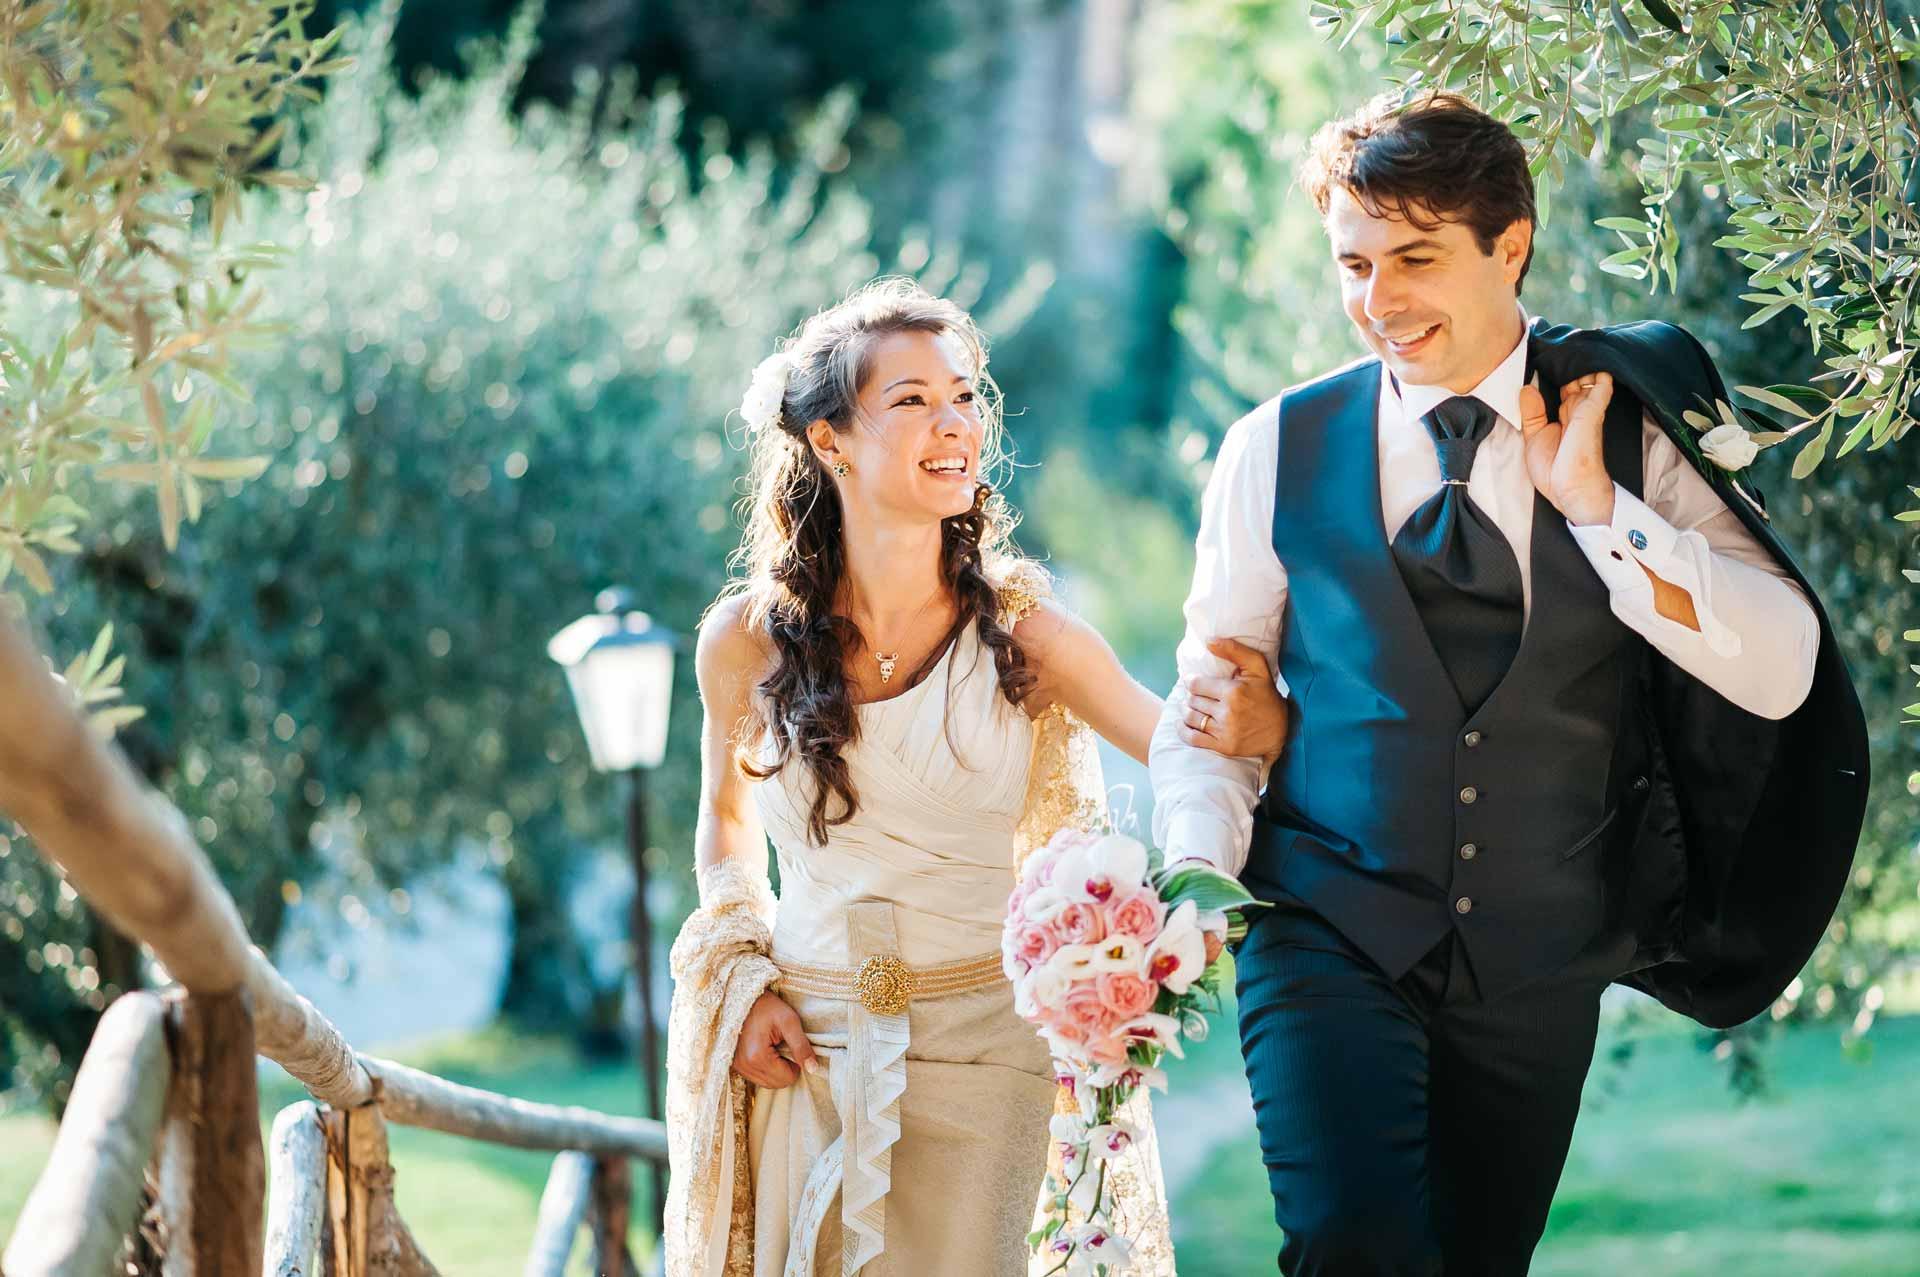 Fotografo-Matrimonio-Roma-Slide-i-21